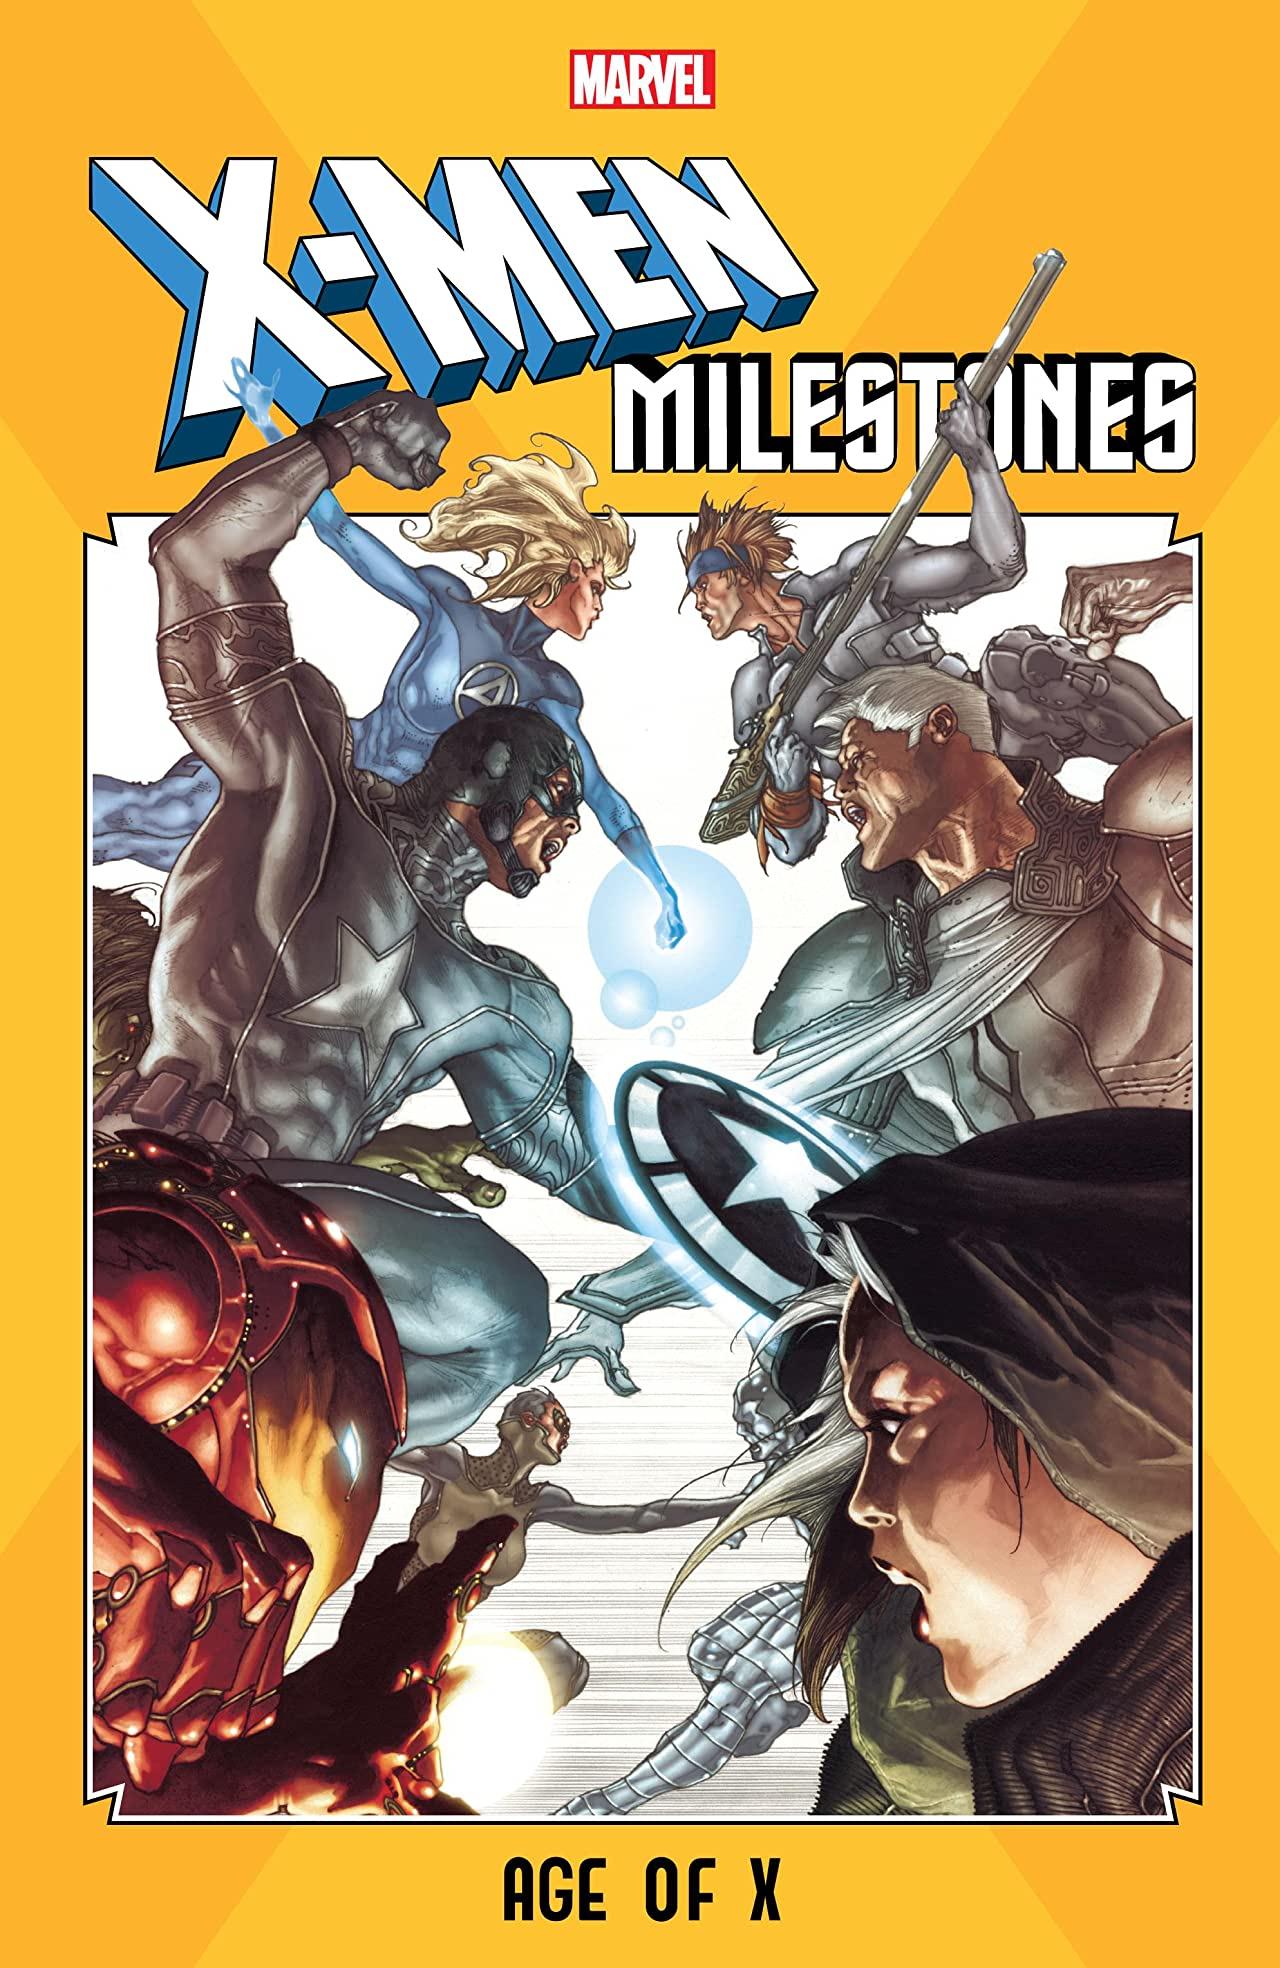 X-Men Milestones: Age Of X (Trade Paperback)